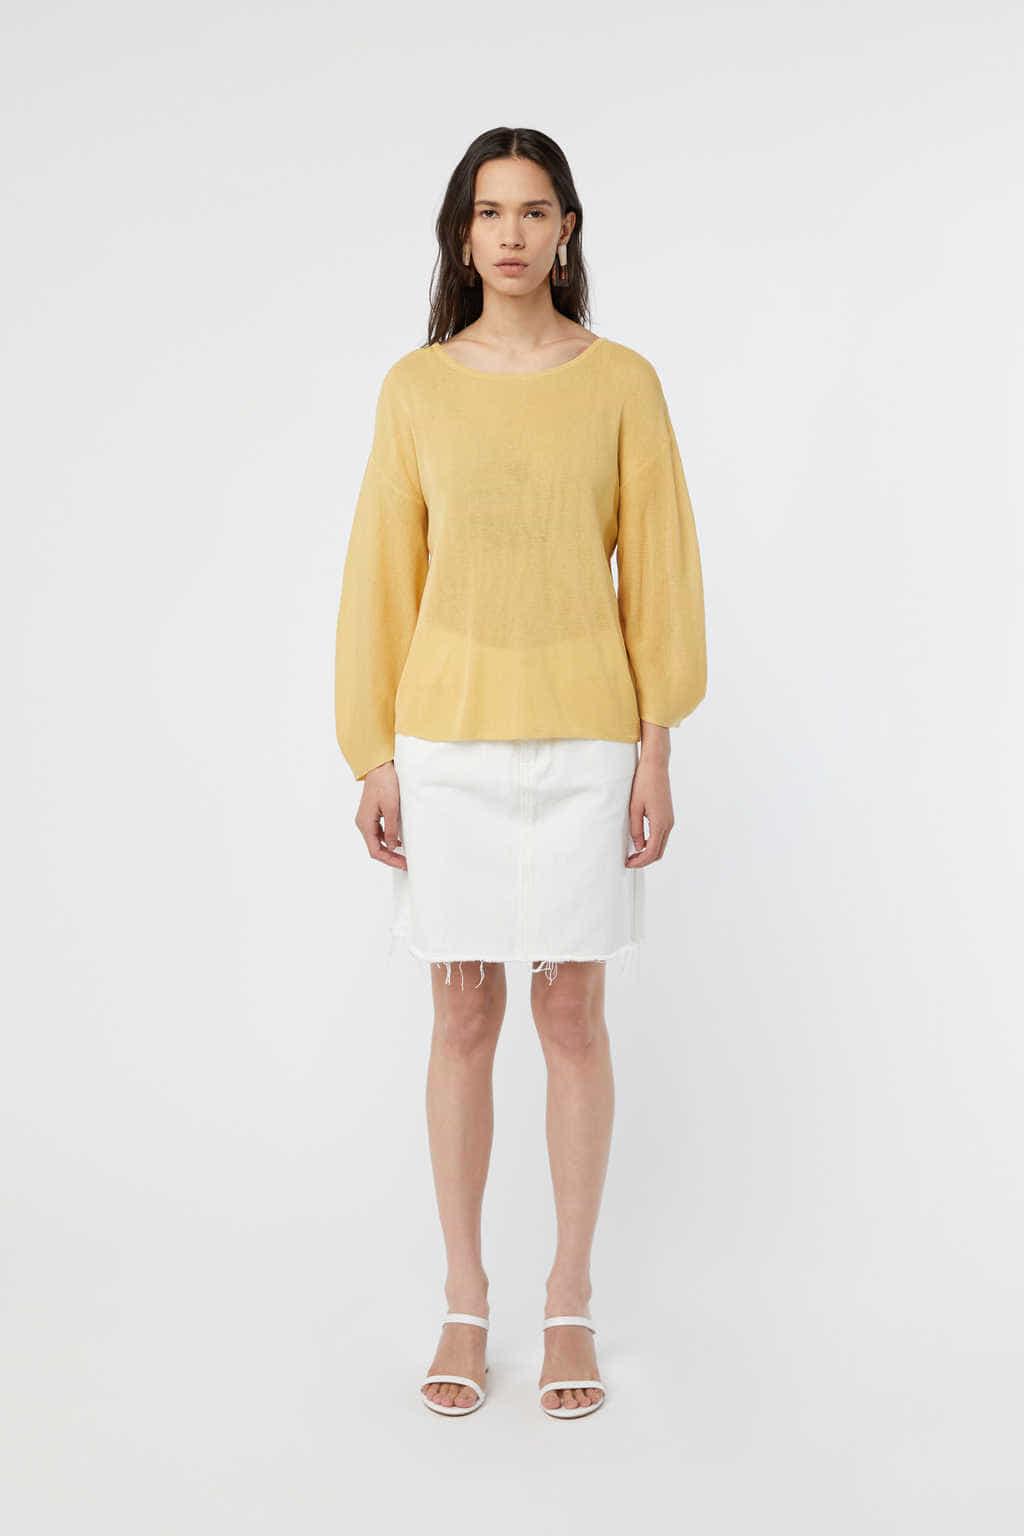 TShirt K010 Yellow 2